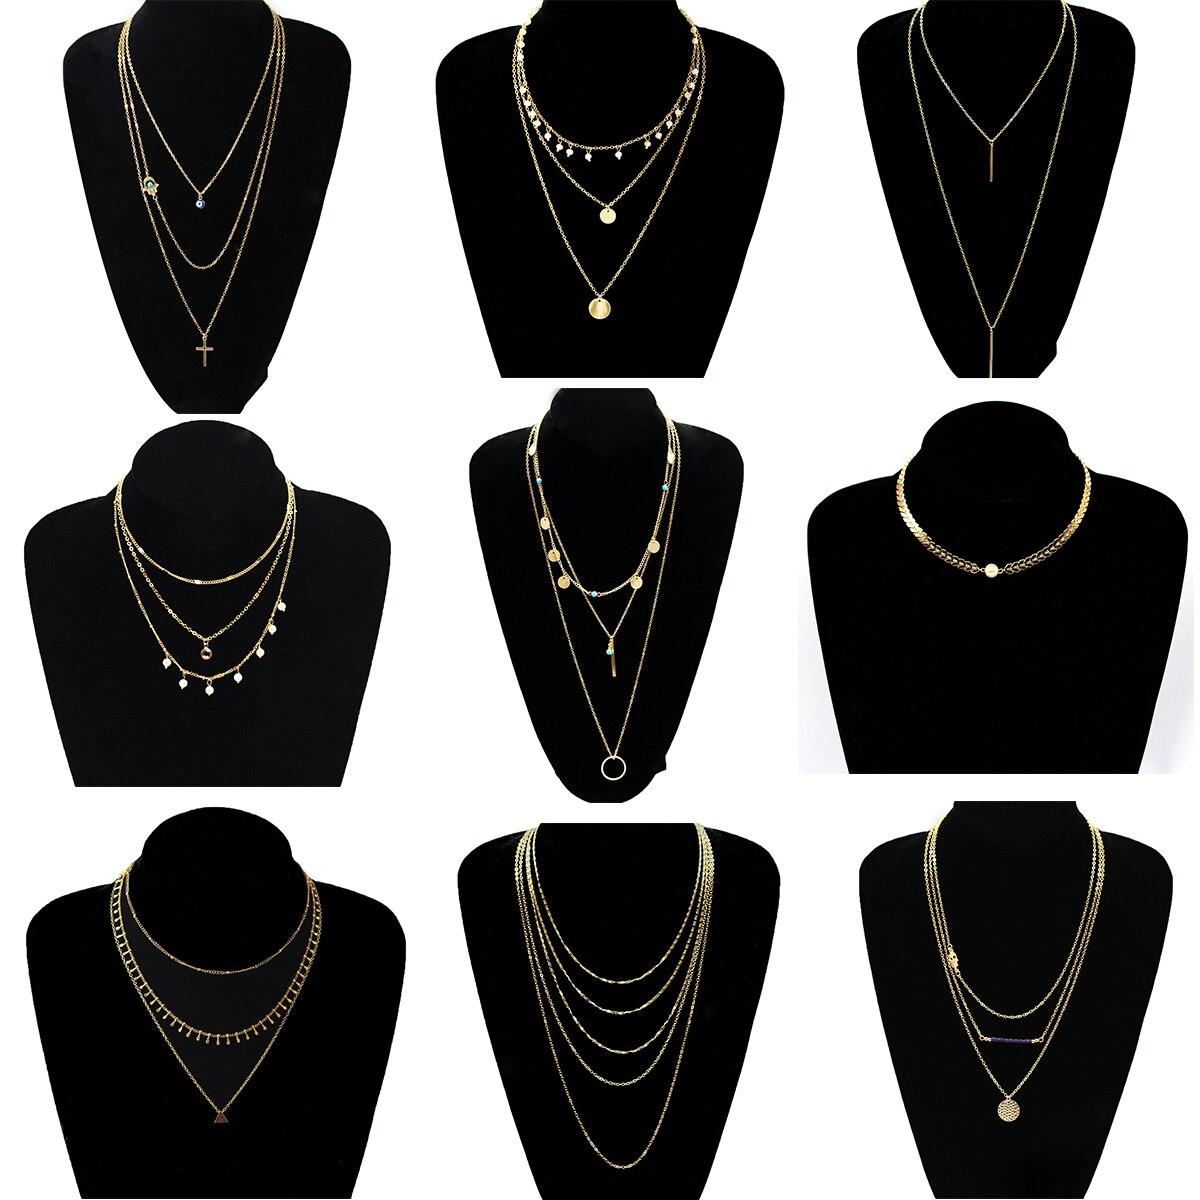 9 Pcs/ Set Fashion Clavicle Long Chain Necklace Pendants Multilayer Gold Color Sequins Beads Choker